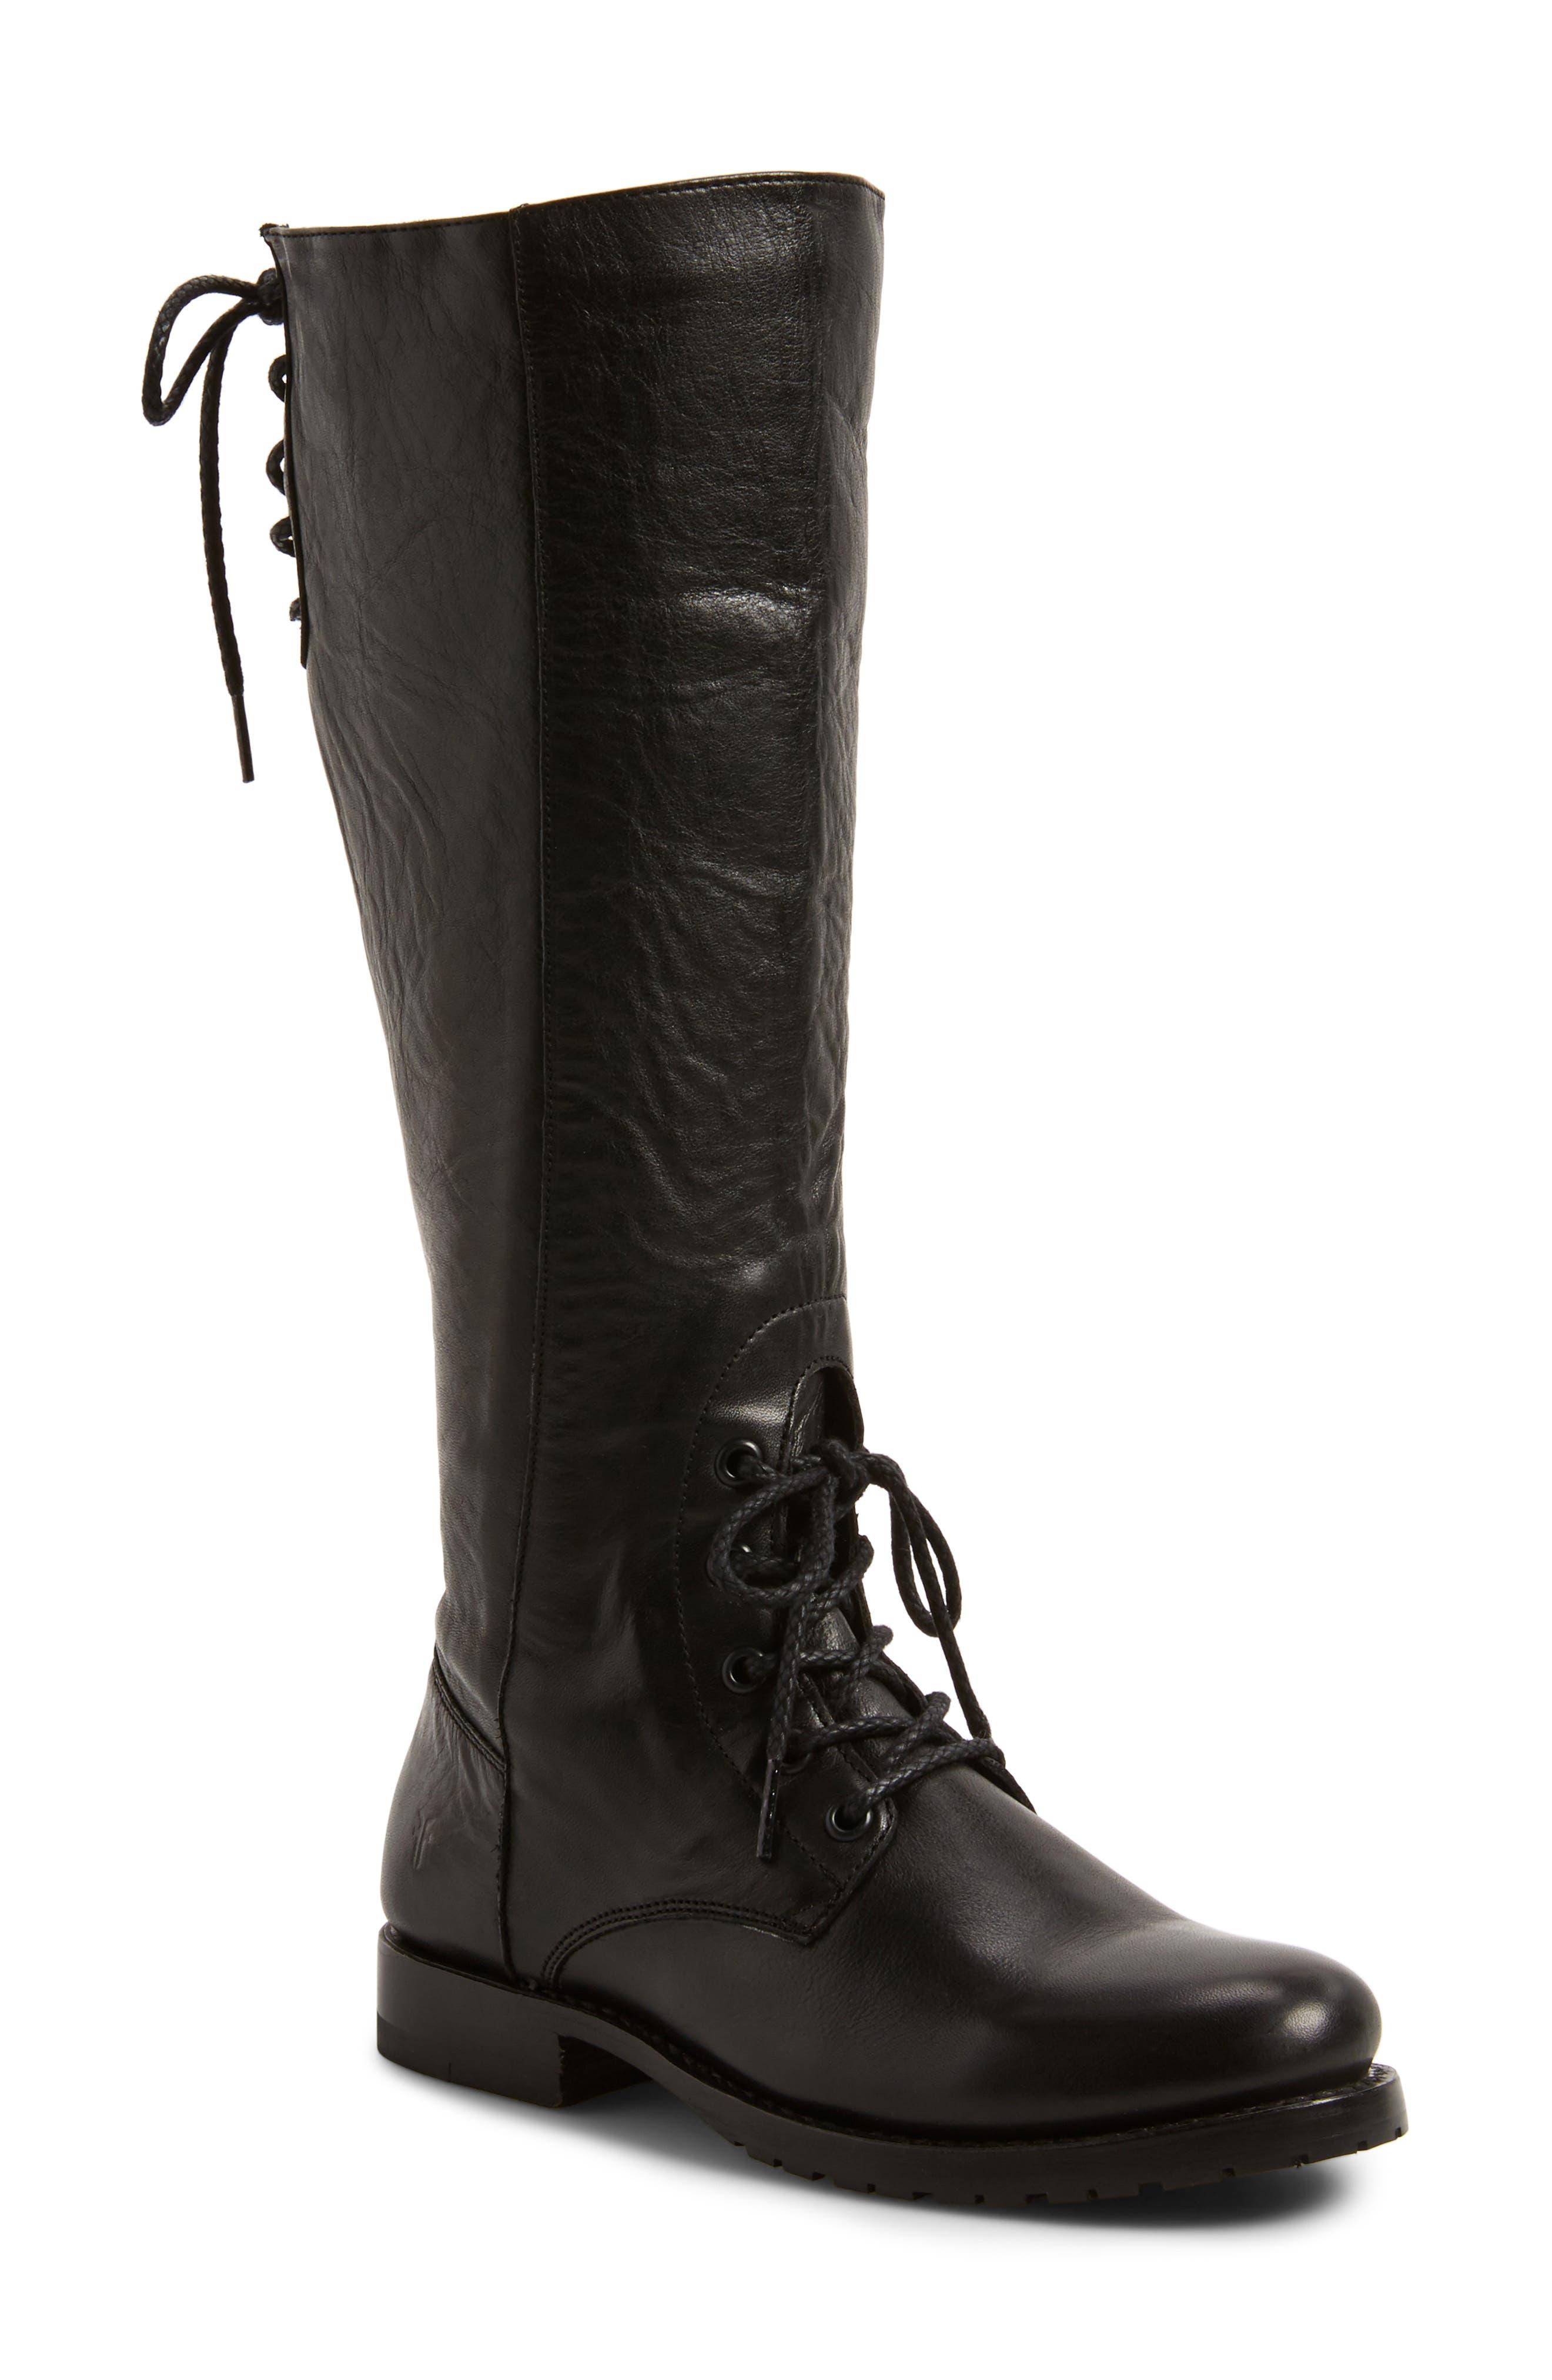 Main Image - Frye Natalie Knee High Combat Boot (Women)